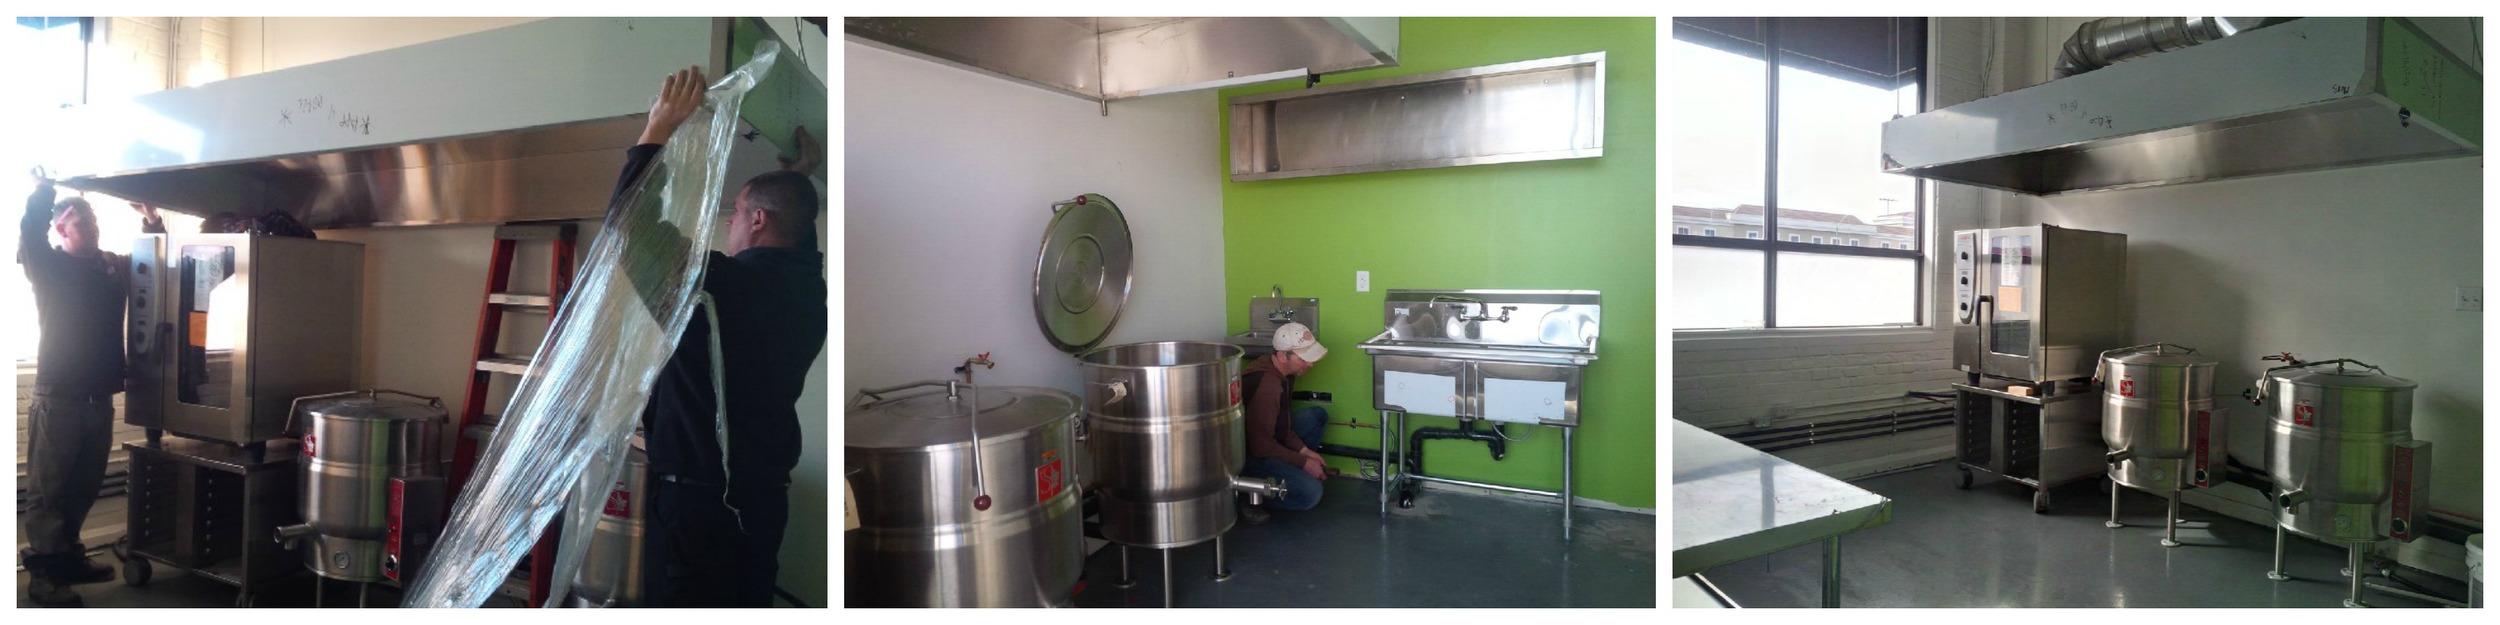 toronto rental kitchen